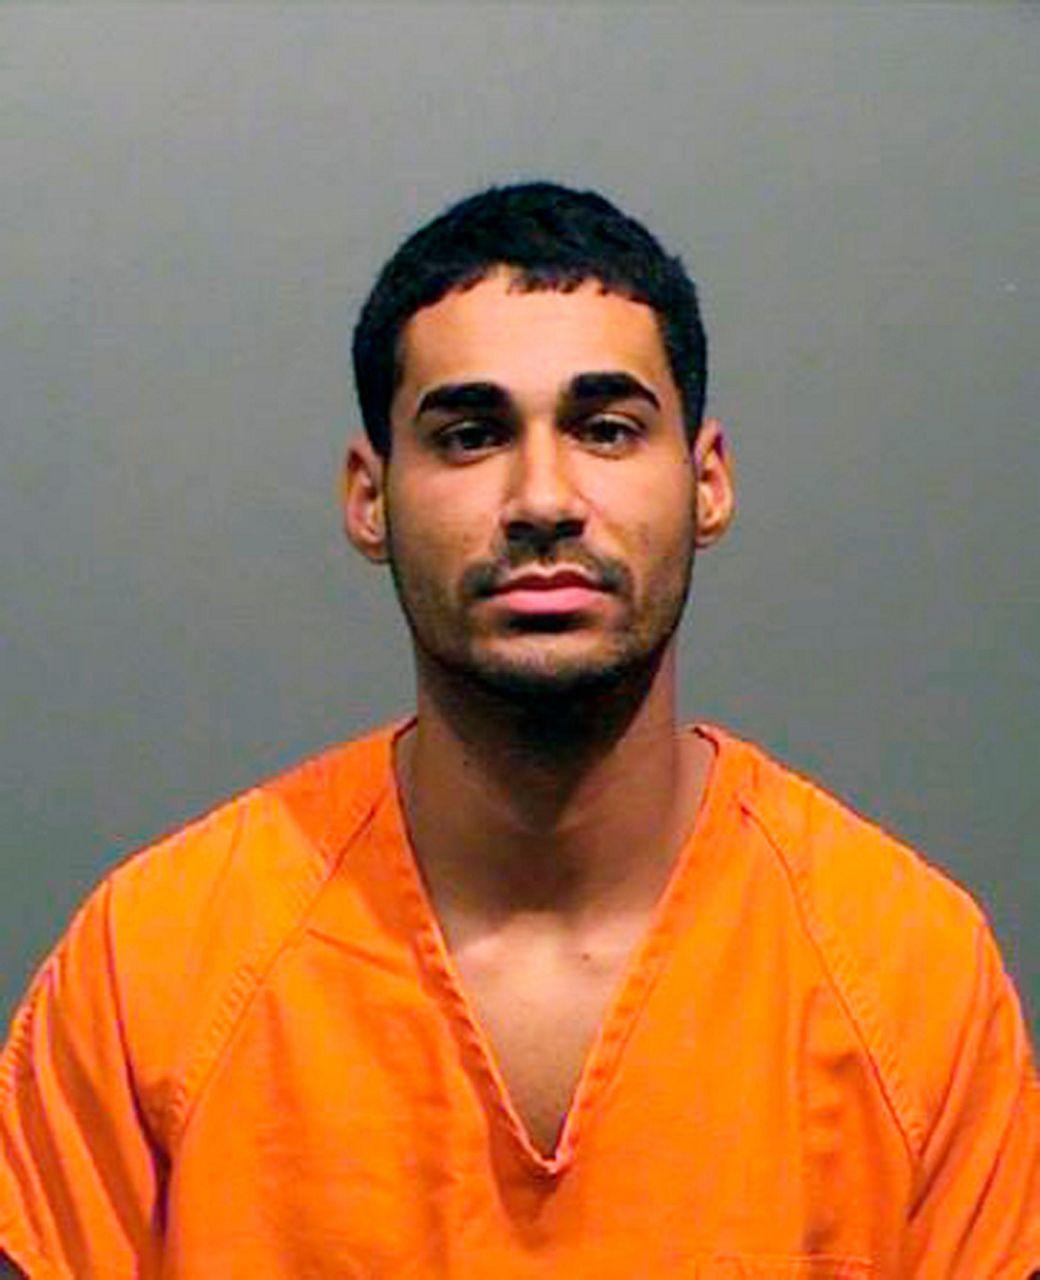 Truck Driver Arrested After Deadly Pileup Near Denver